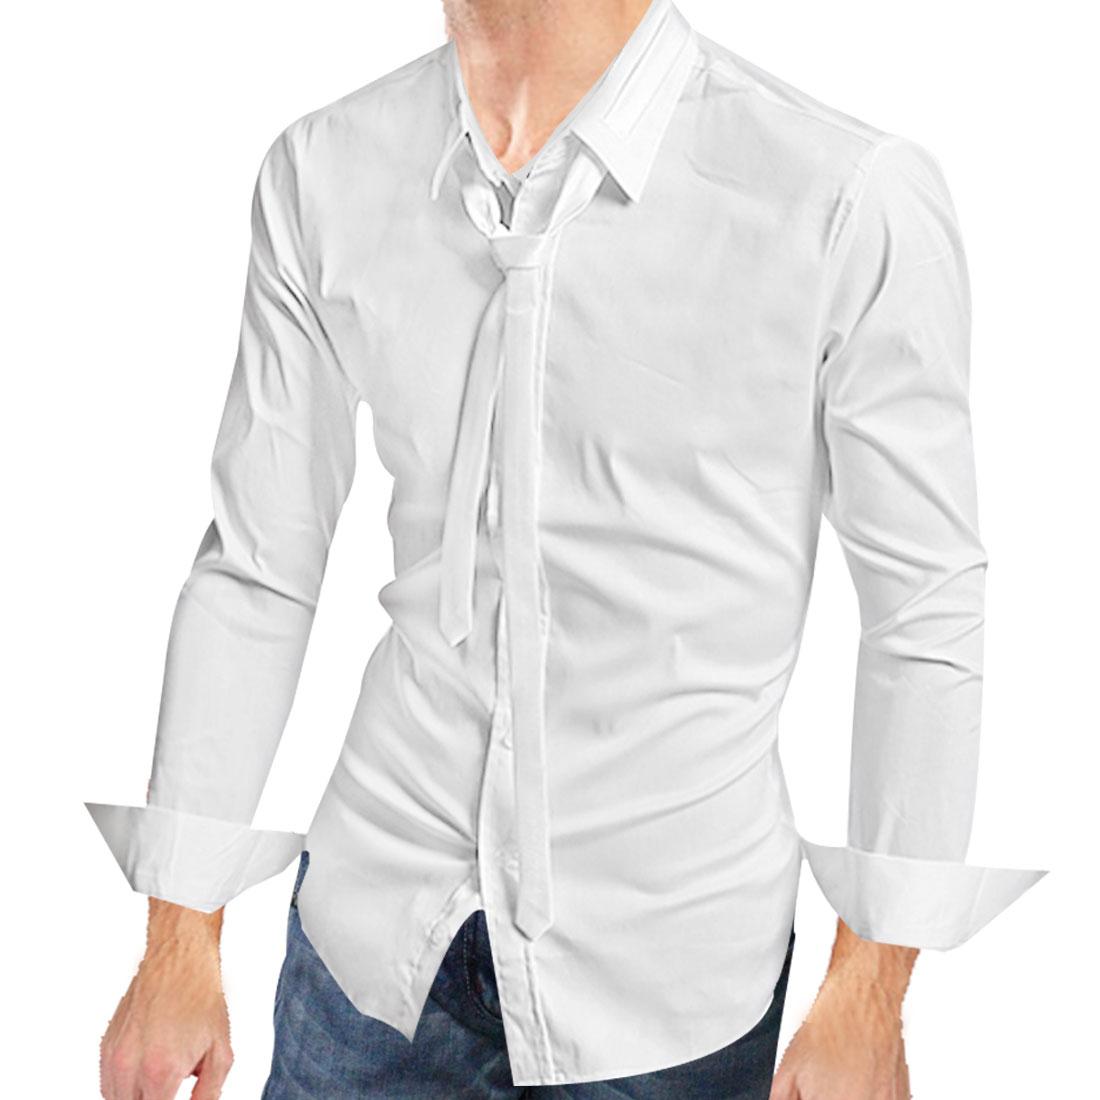 Mens White Fashion Long Sleeve Button Down French Cuff Slim Fall Shirt S